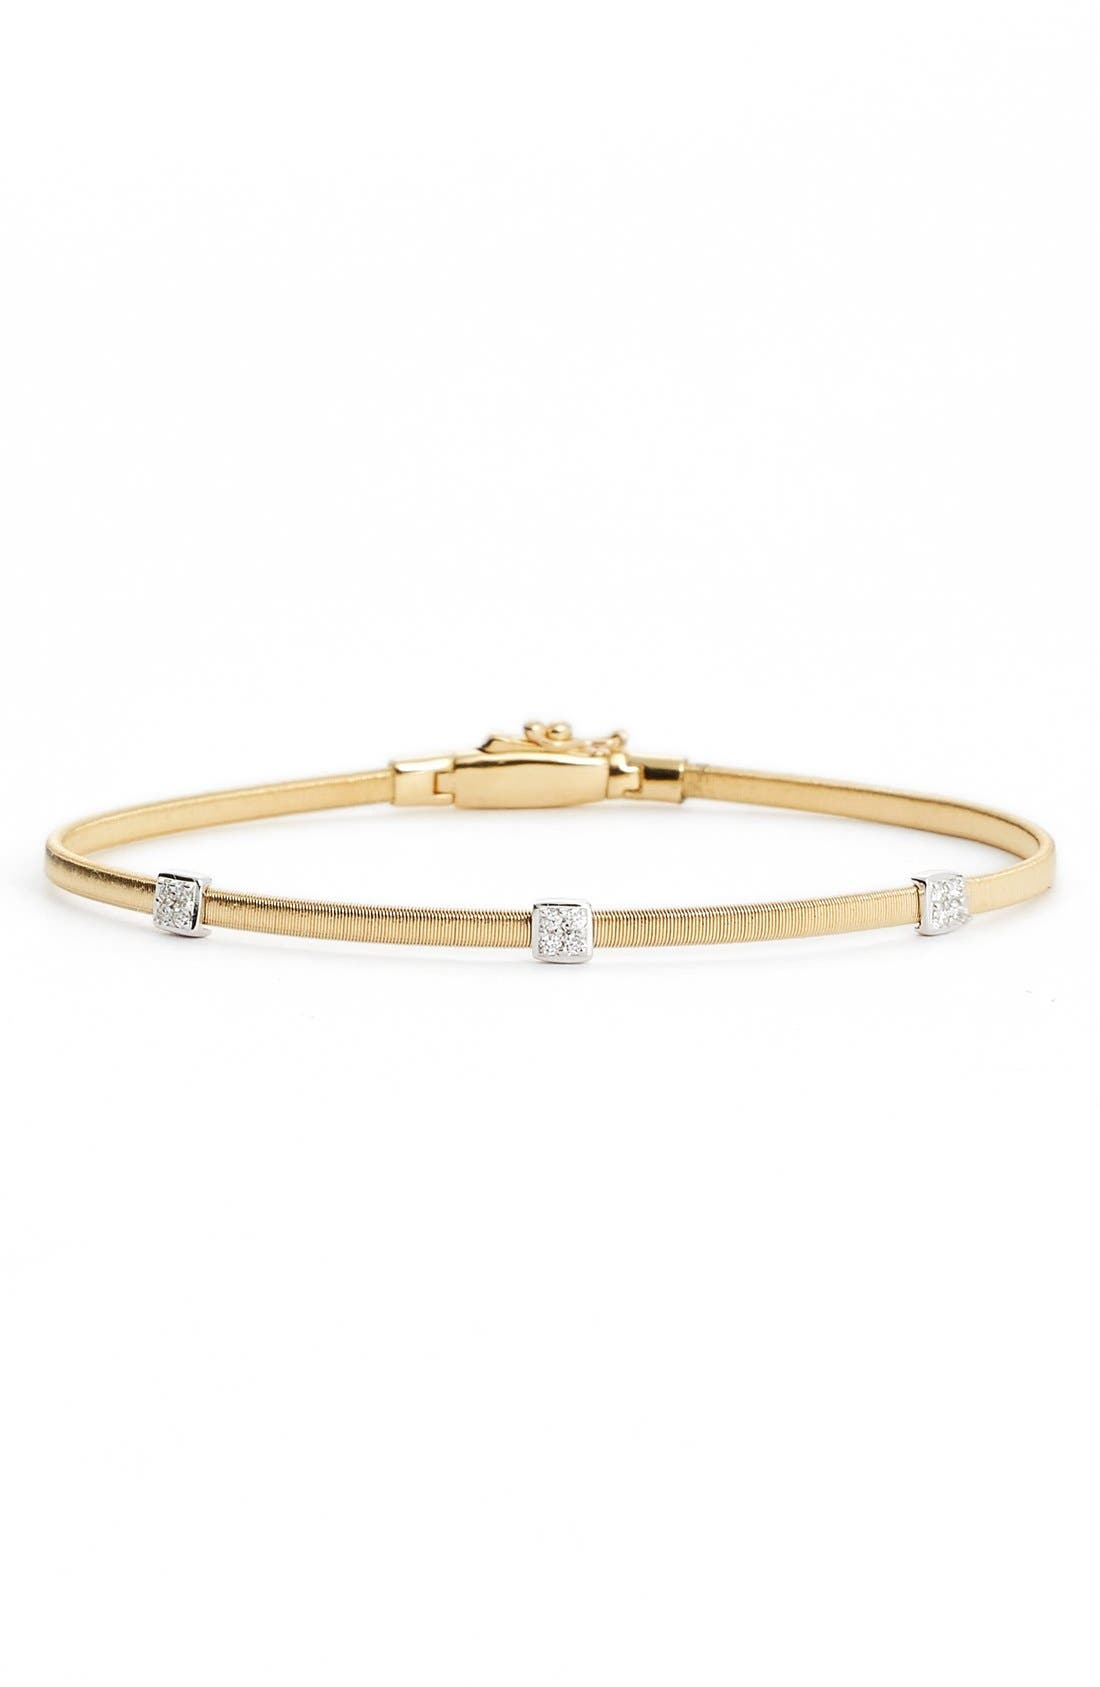 Masai Small Station Diamond Bracelet,                             Main thumbnail 1, color,                             Yellow Gold